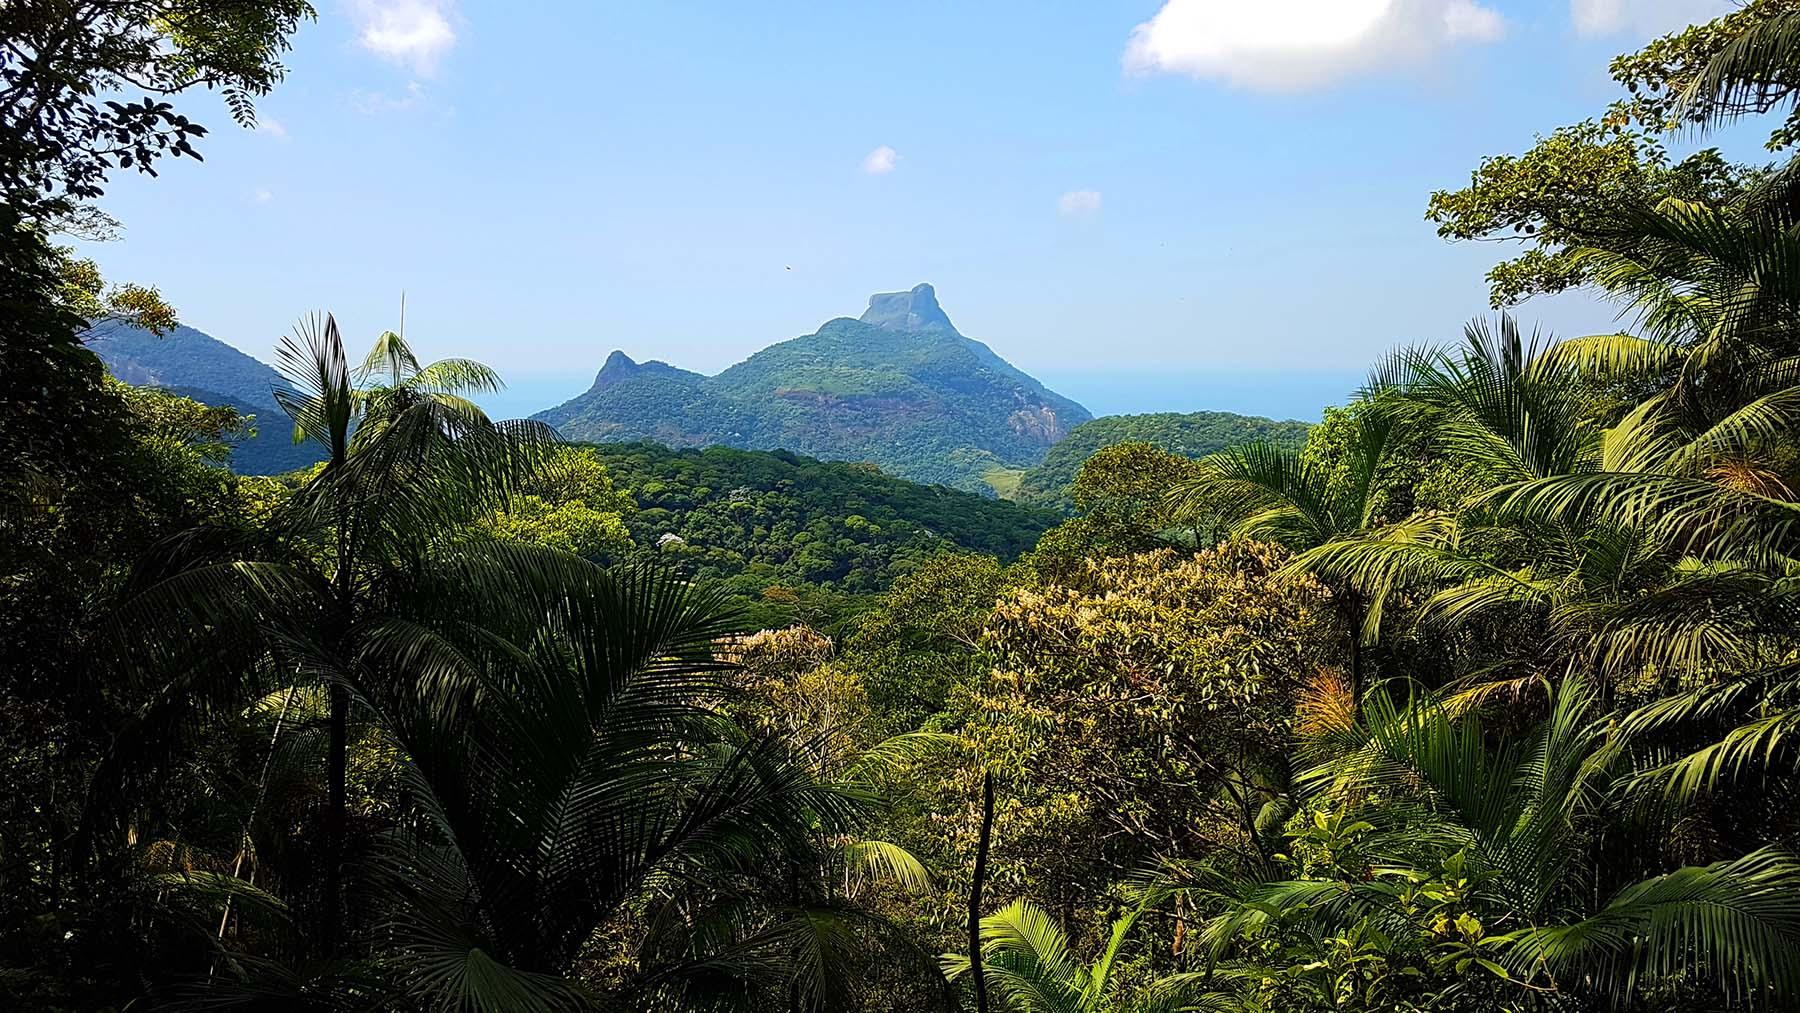 Dicas de Mirantes do Rio de Janeiro